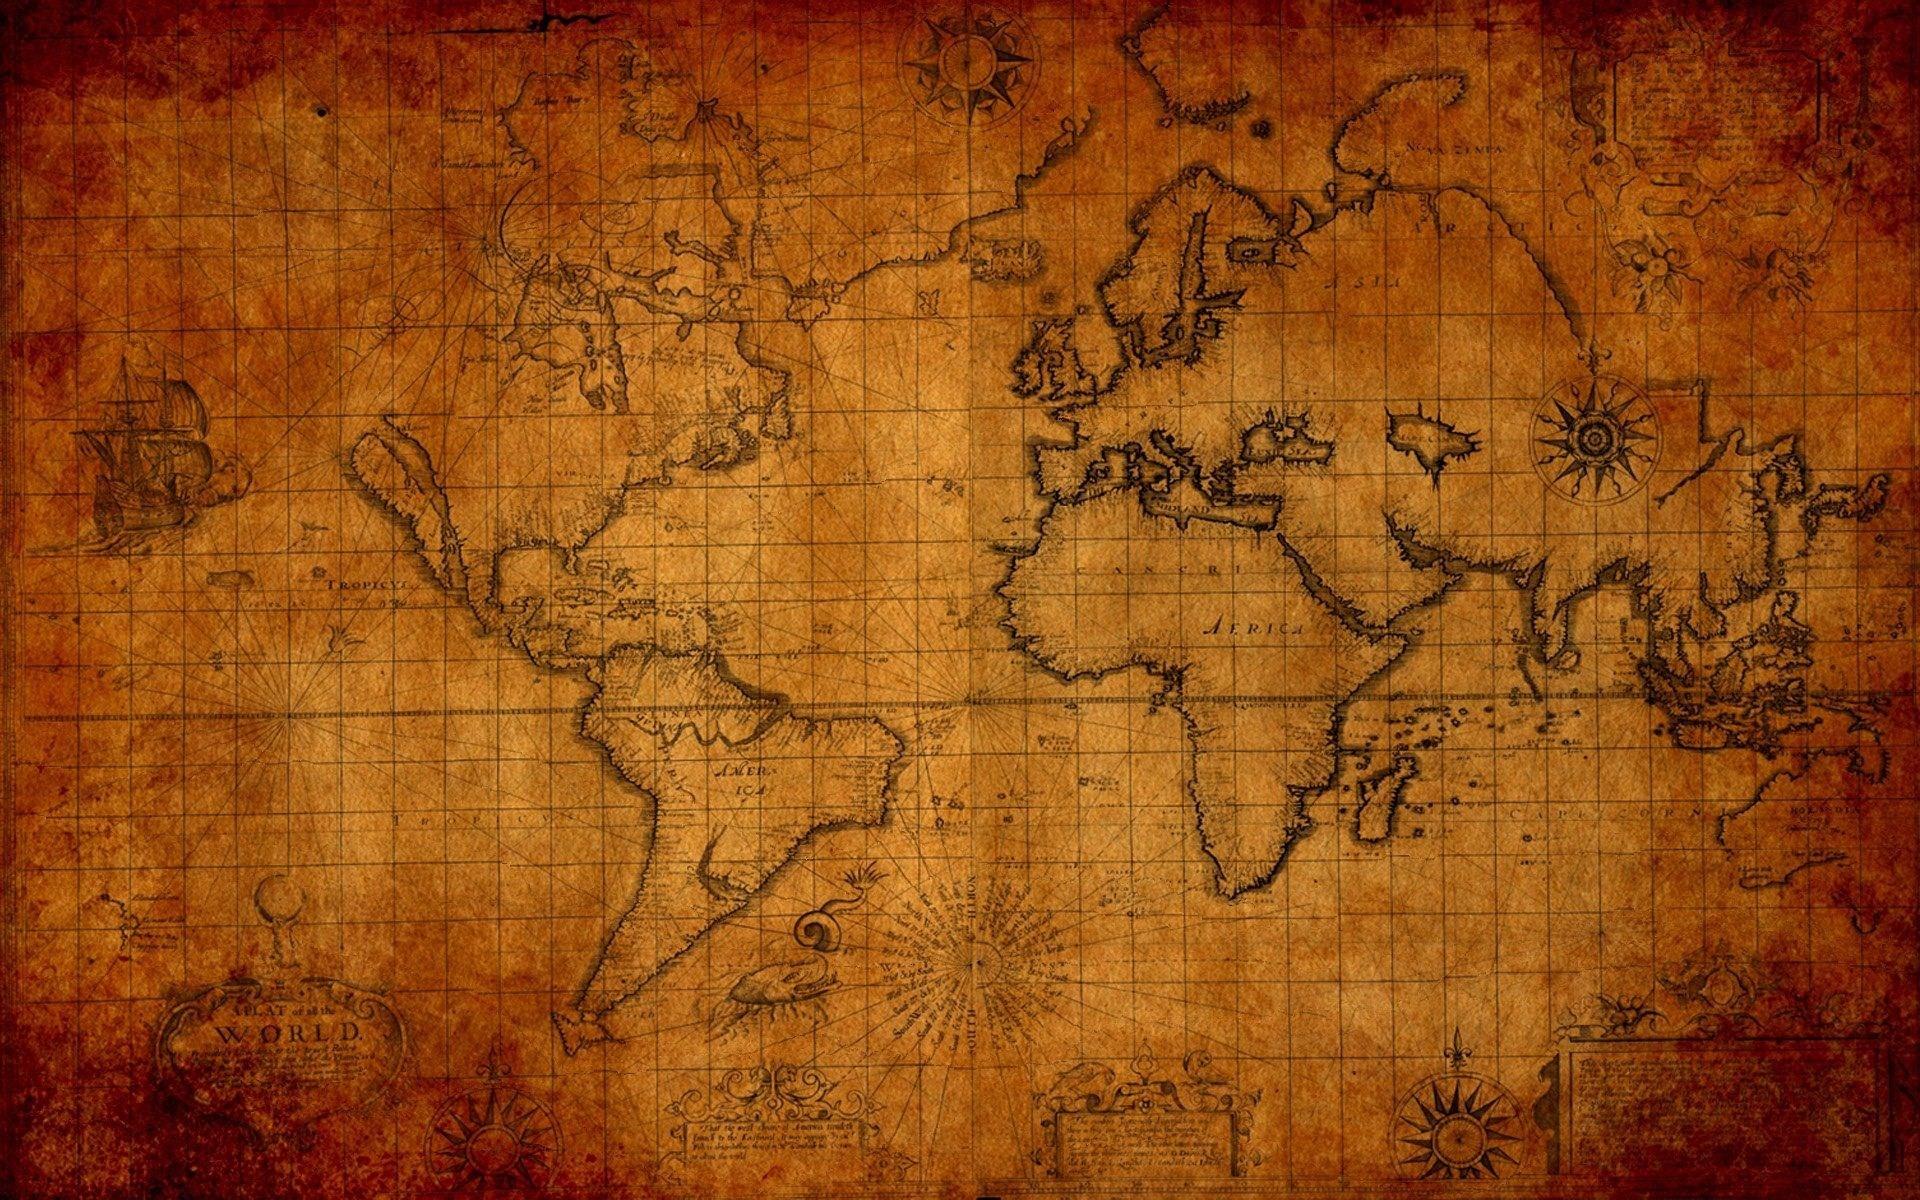 Antique World Map Wallpaper 39 images 1920x1200